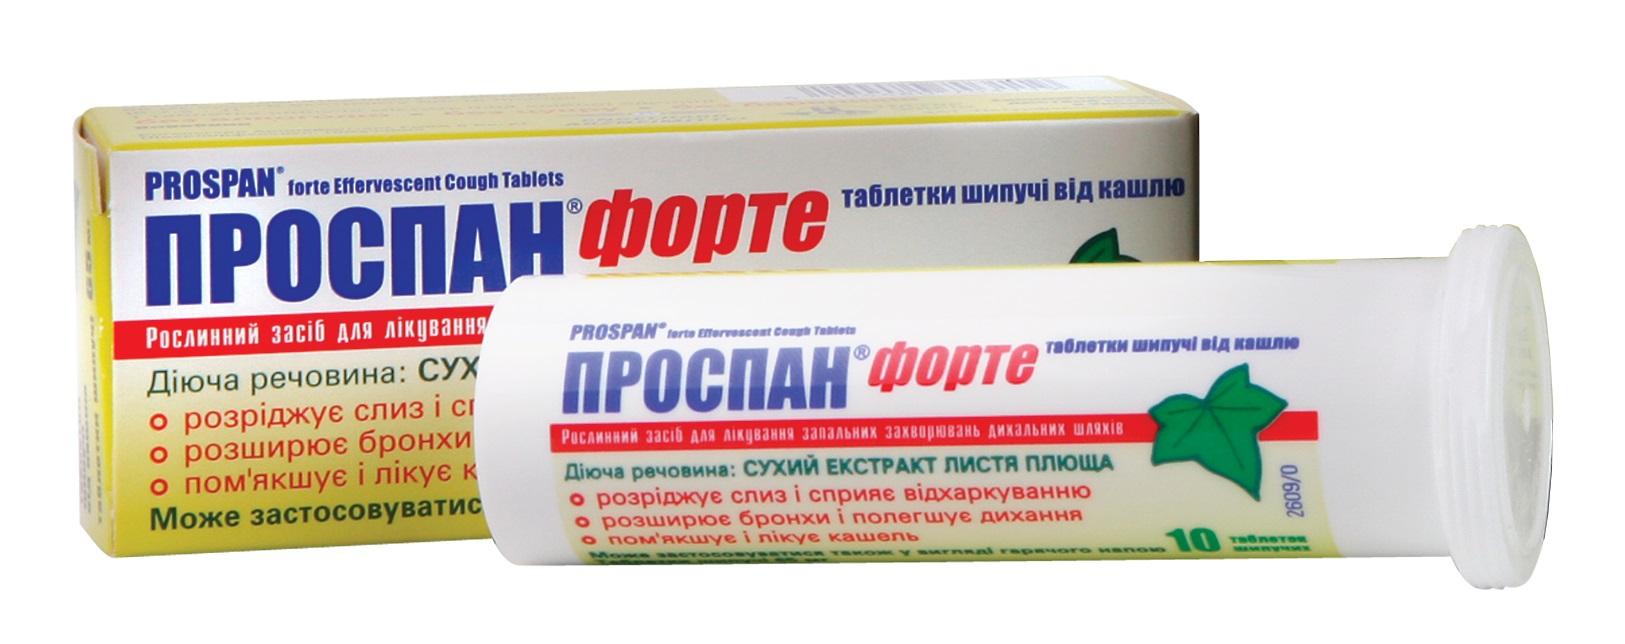 Проспан цена таблетки инструкция